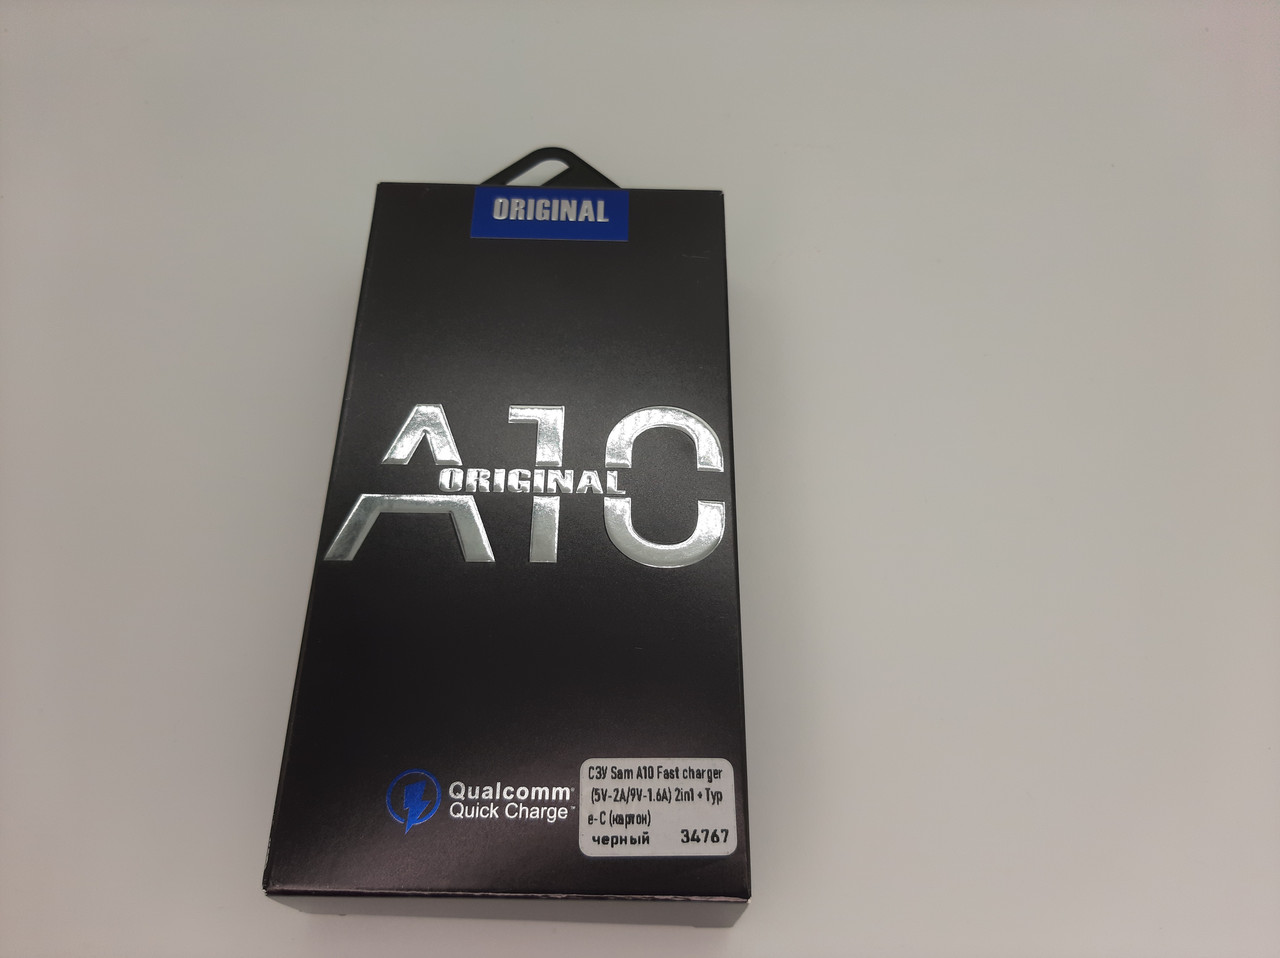 СЗУ Samsung A10 Fast charger (5V-2A/9V-1.6A) 2in1 + Type-C (картон) (черный)